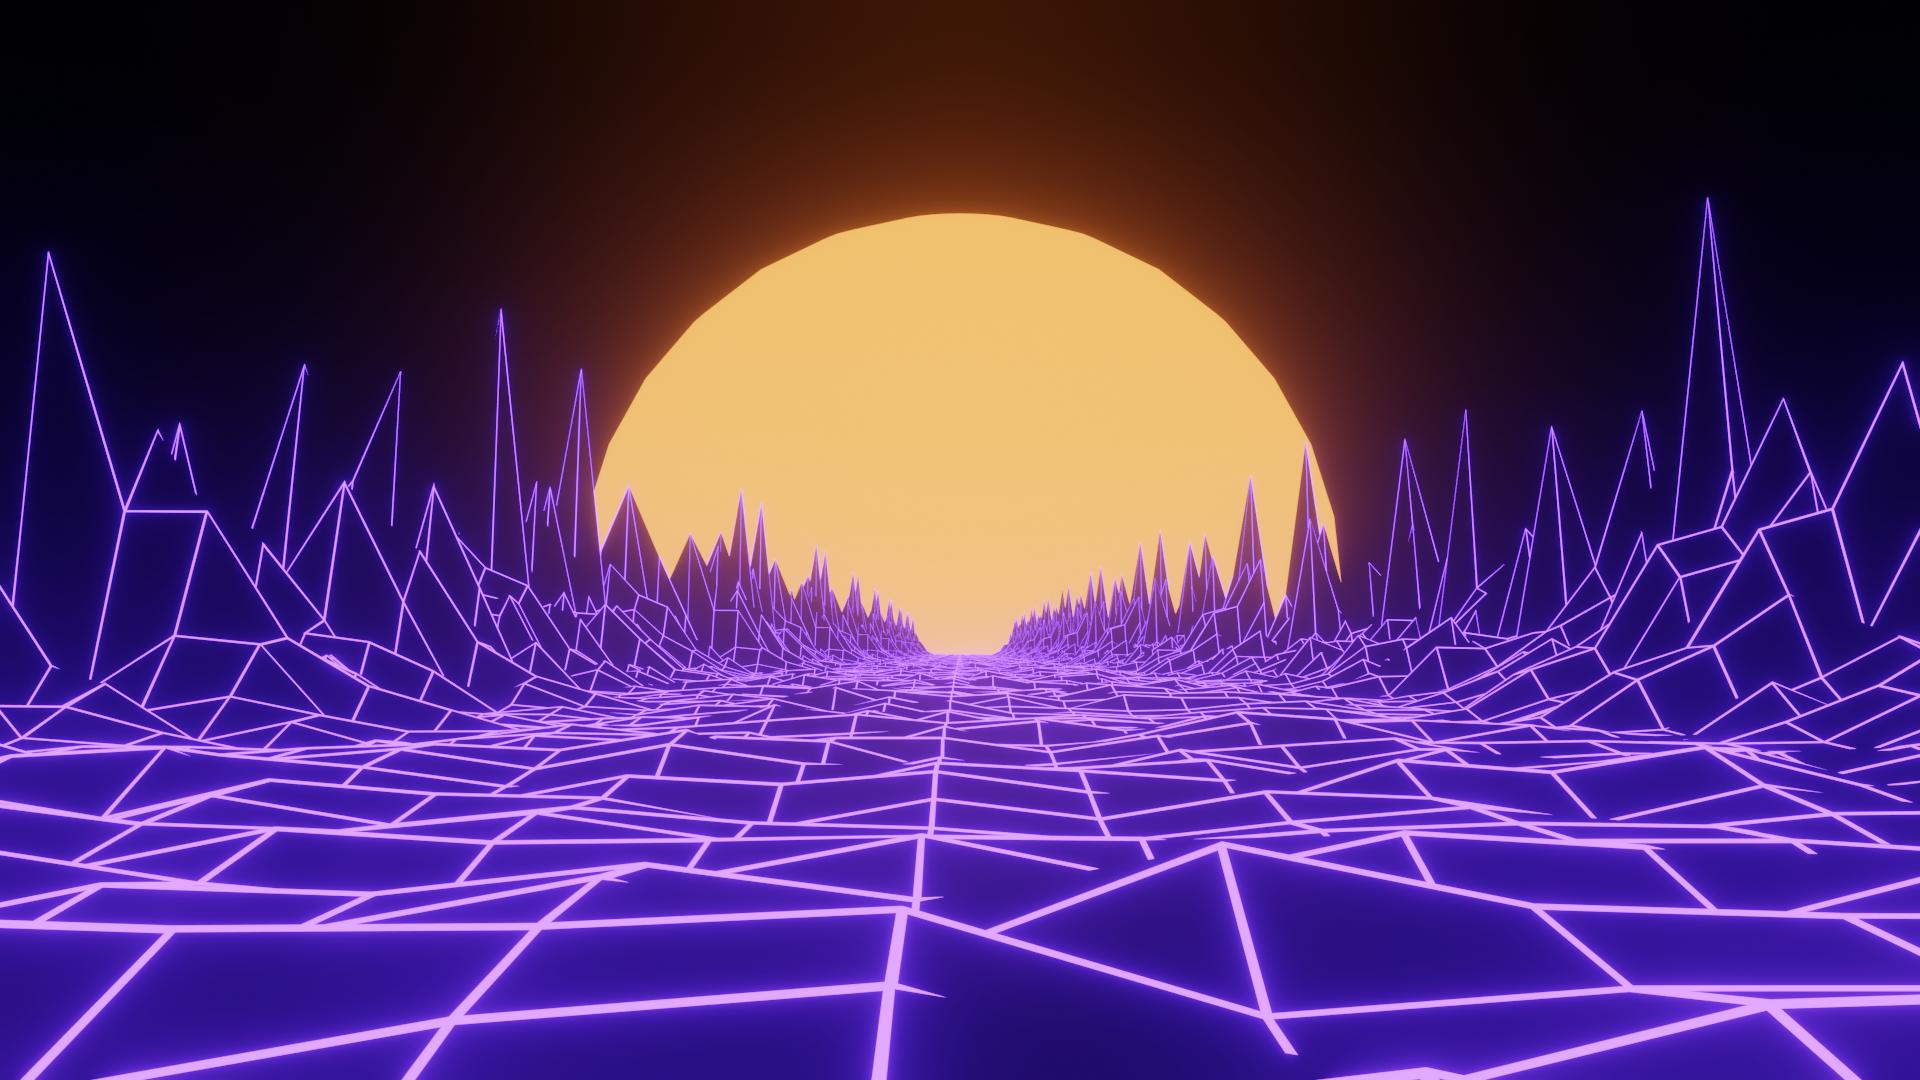 [1920x1080] Vaporwave-y thing I did   Desktop wallpaper ...